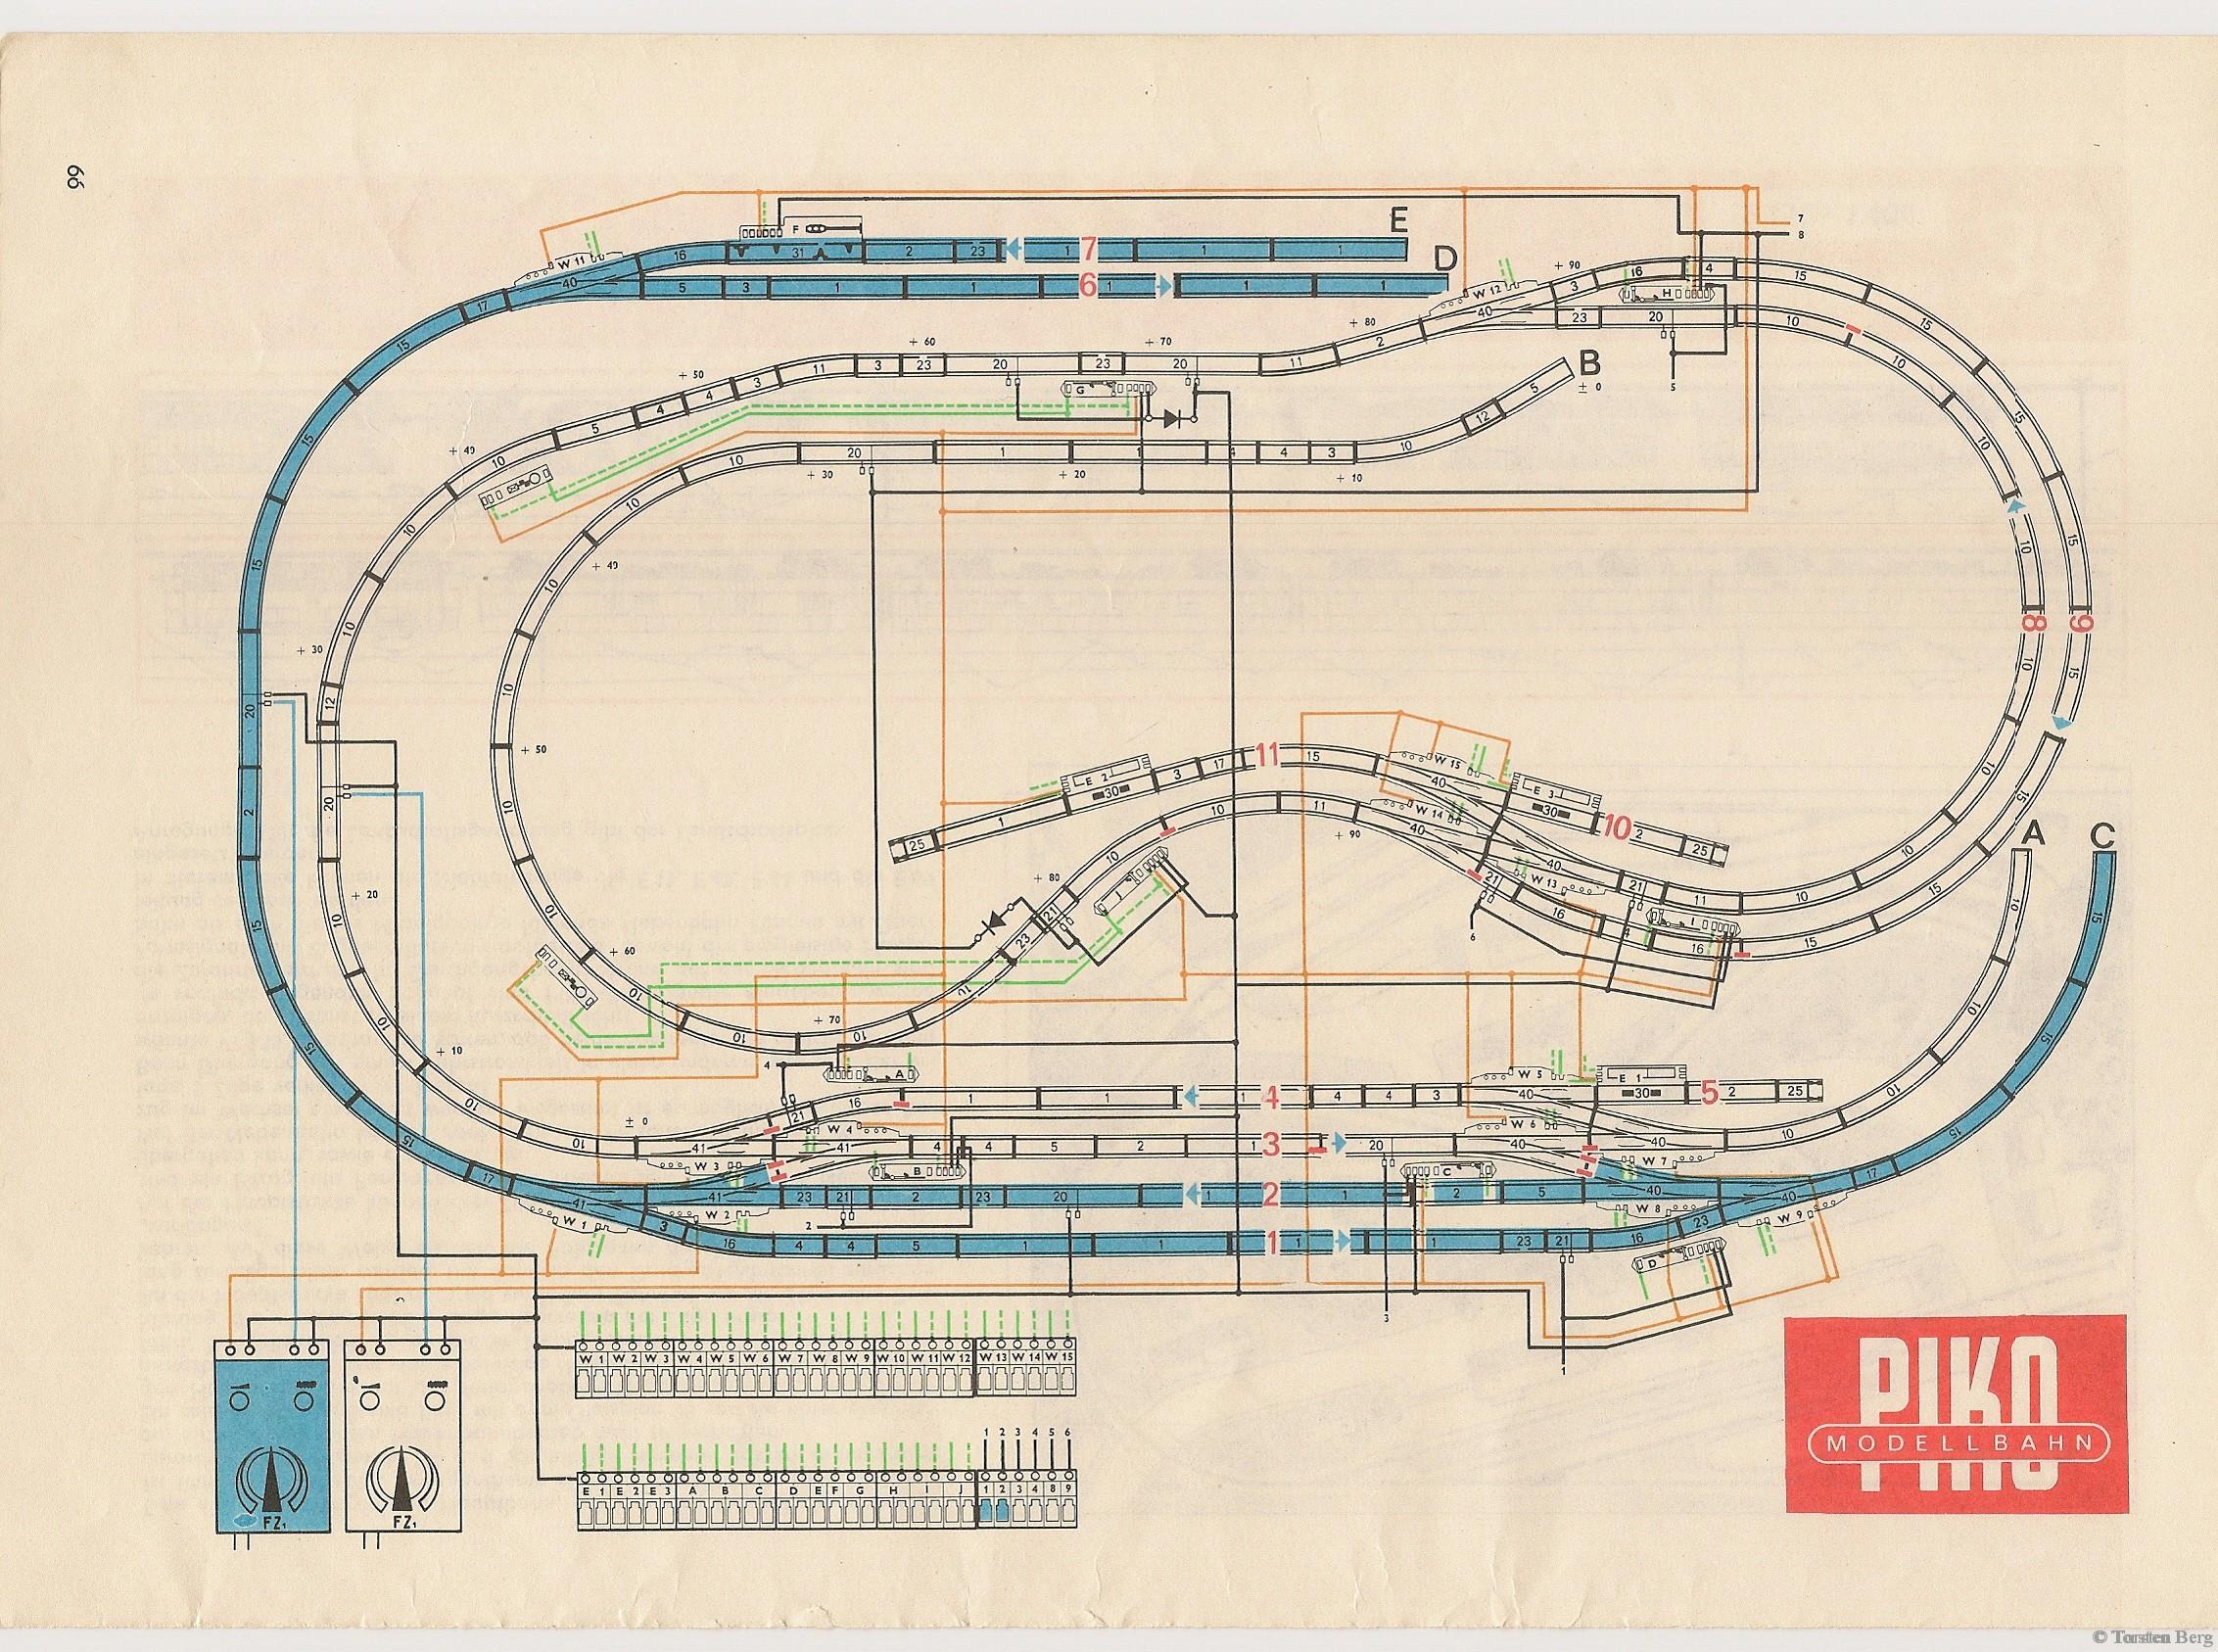 VEB Kombinat PIKO Standardgleis-Gleisplan 39